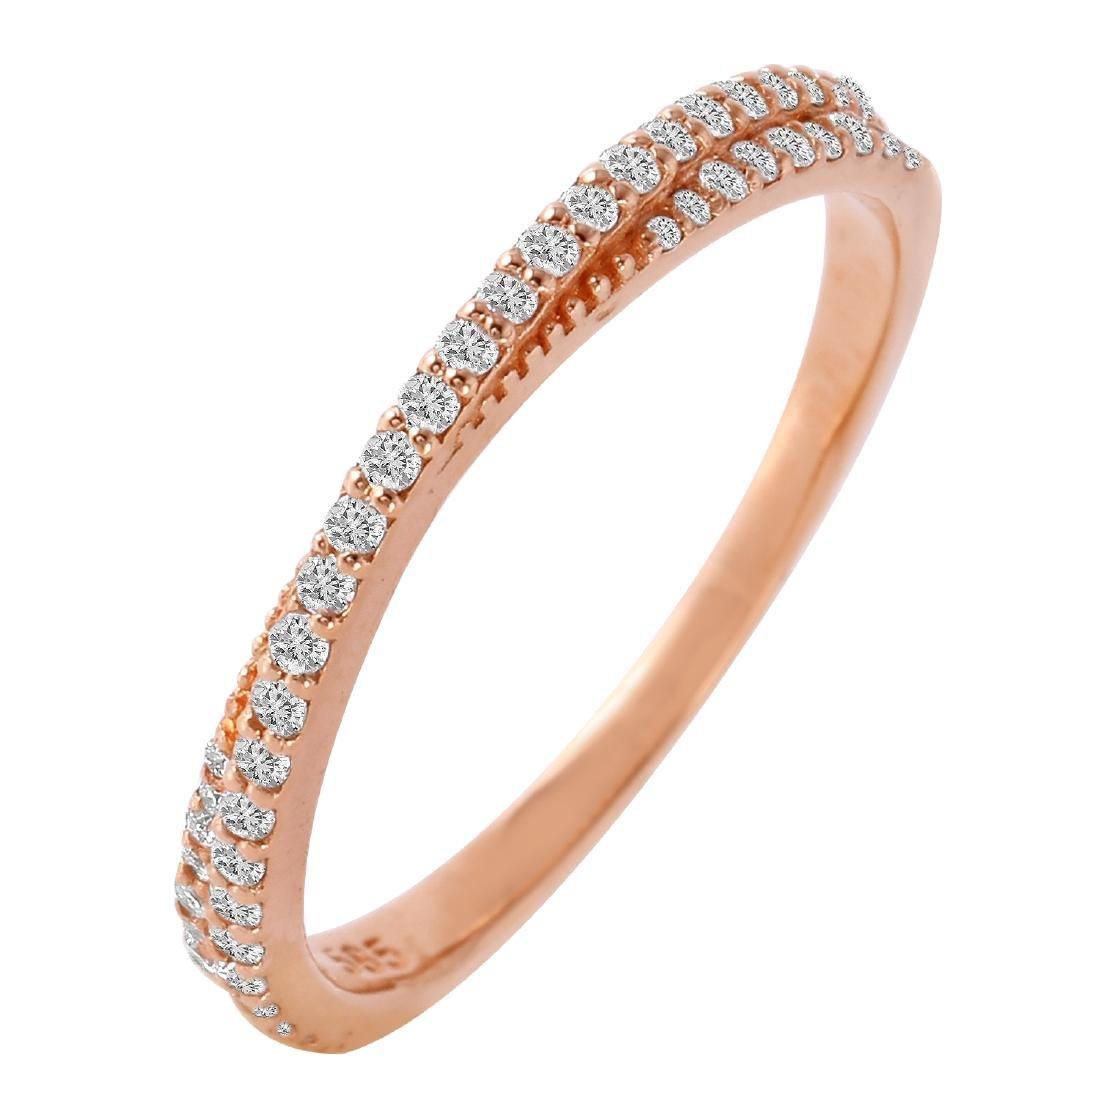 0.25 Carat Natural Diamond 18K Solid Rose Gold Ring